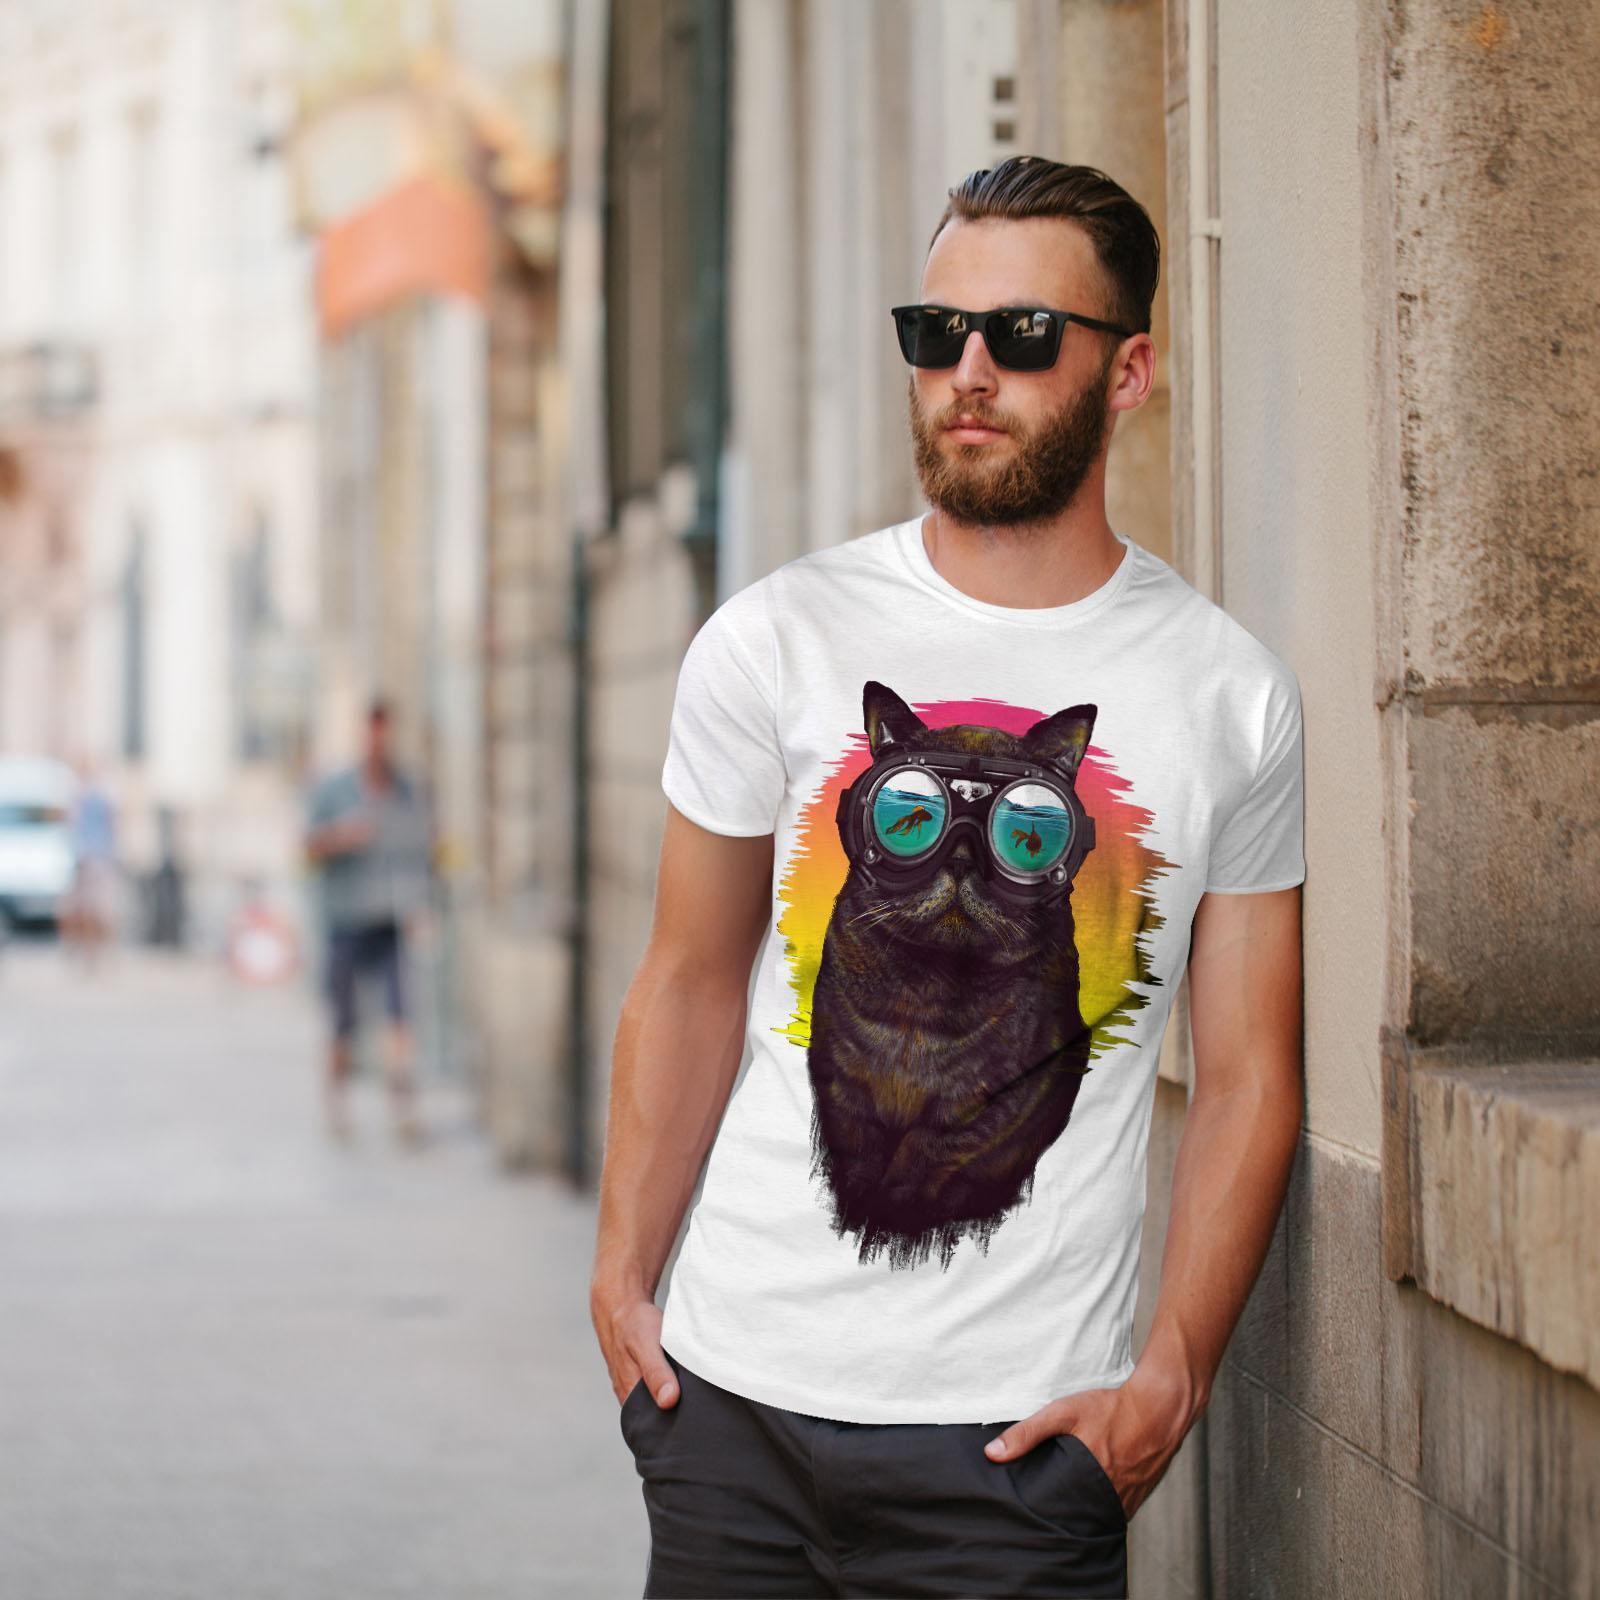 Wellcoda-Hippie-Glasses-Cool-Cat-Mens-T-shirt-Fish-Graphic-Design-Printed-Tee thumbnail 11